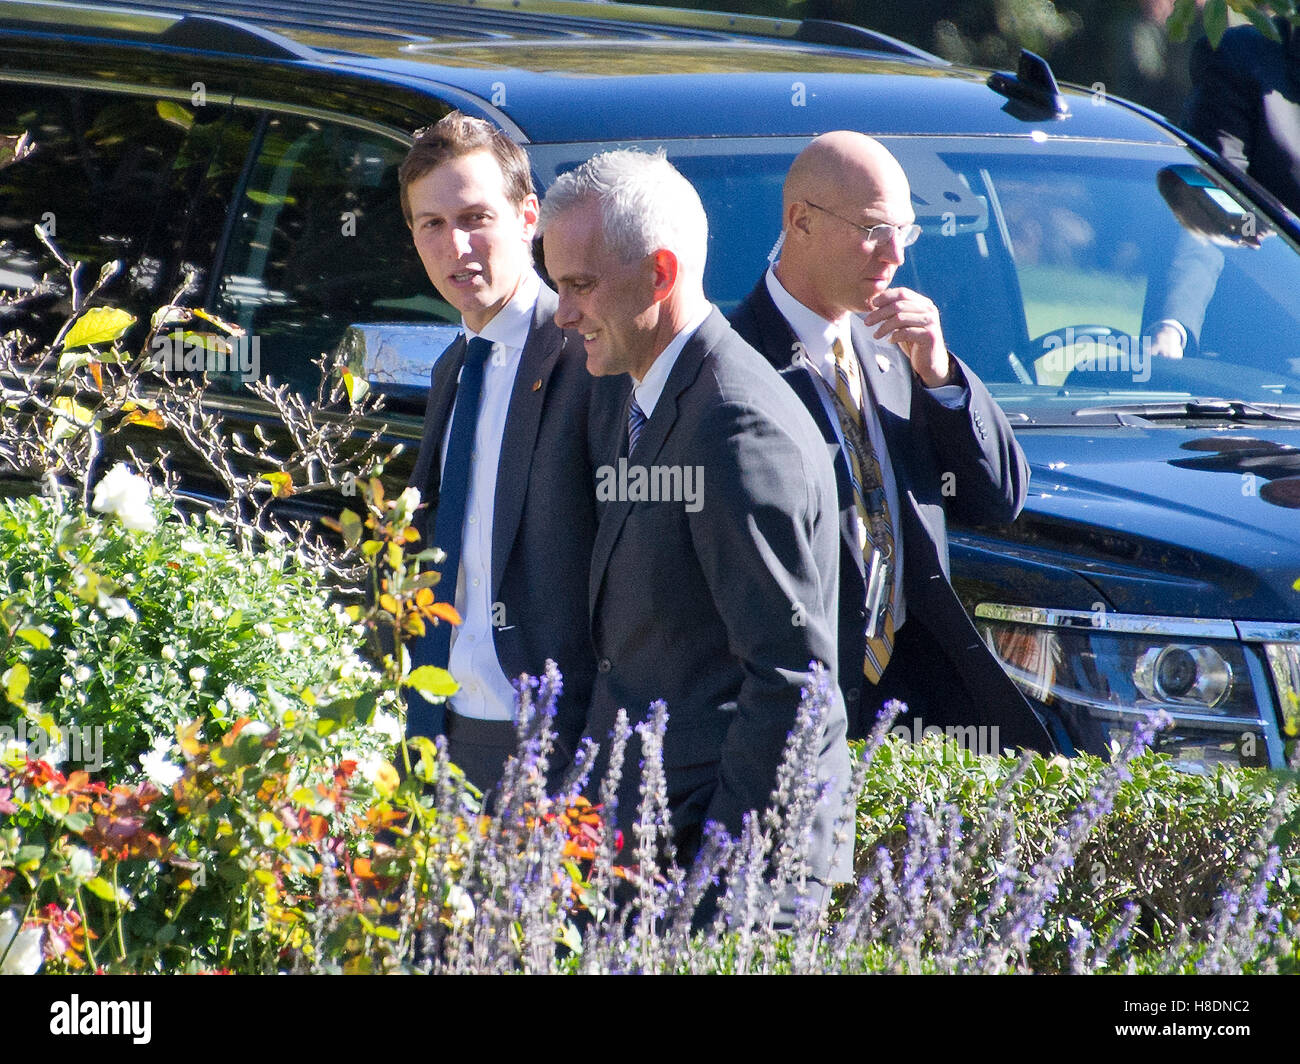 Washington, Us. 10th Nov, 2016. Jared Kushner and White House Chief of Staff Denis McDonough walk through the Rose Stock Photo